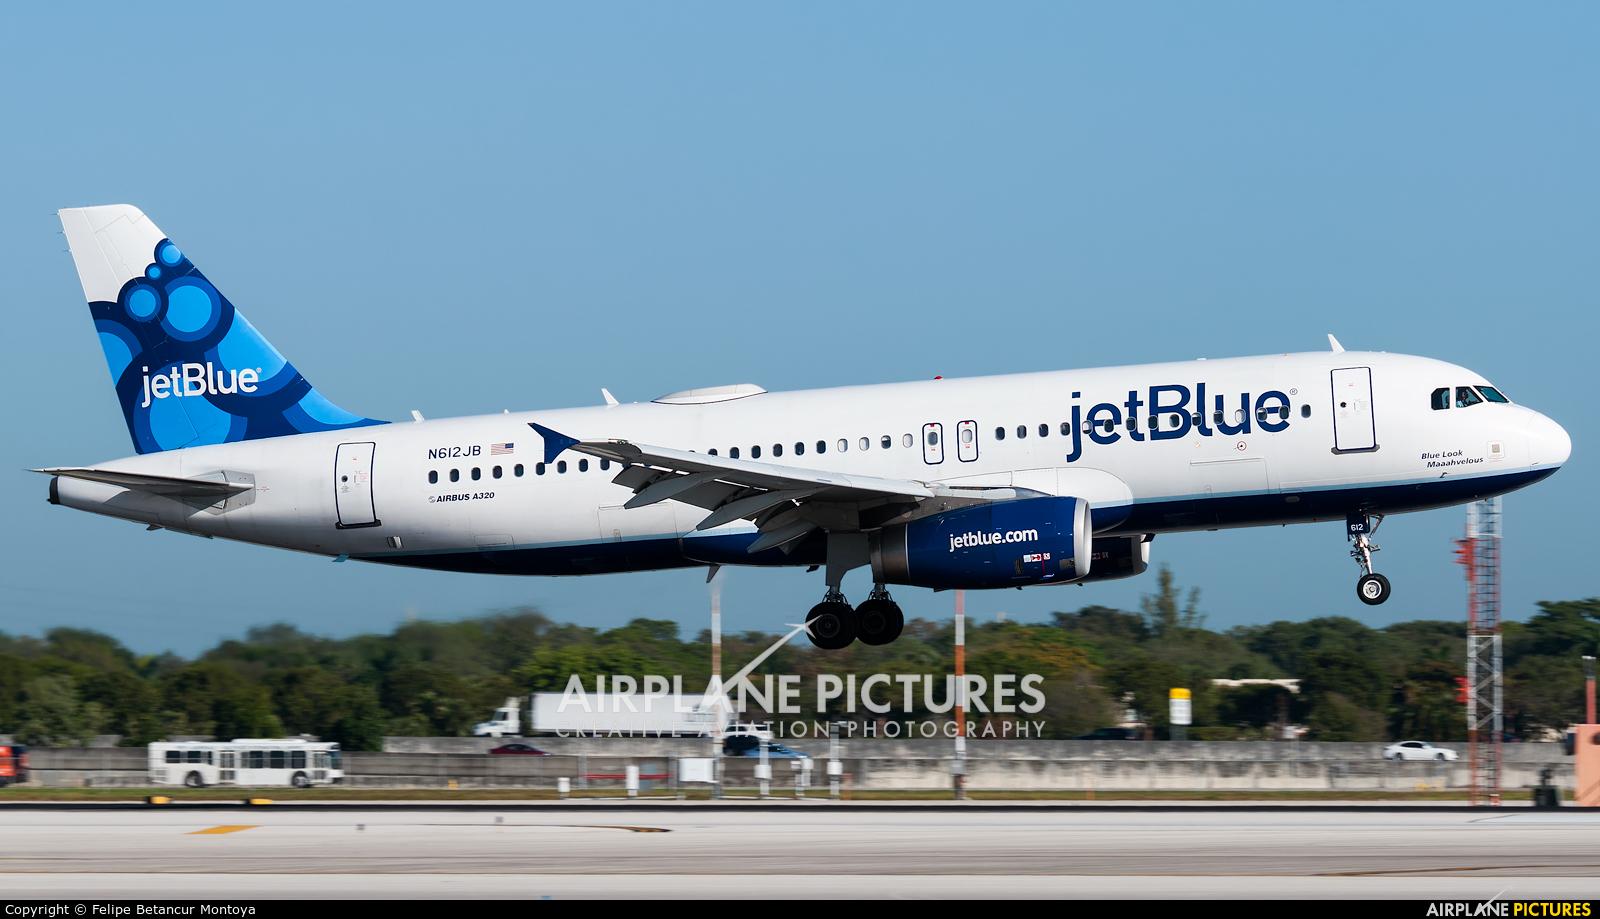 JetBlue Airways N612JB aircraft at Fort Lauderdale - Hollywood Intl